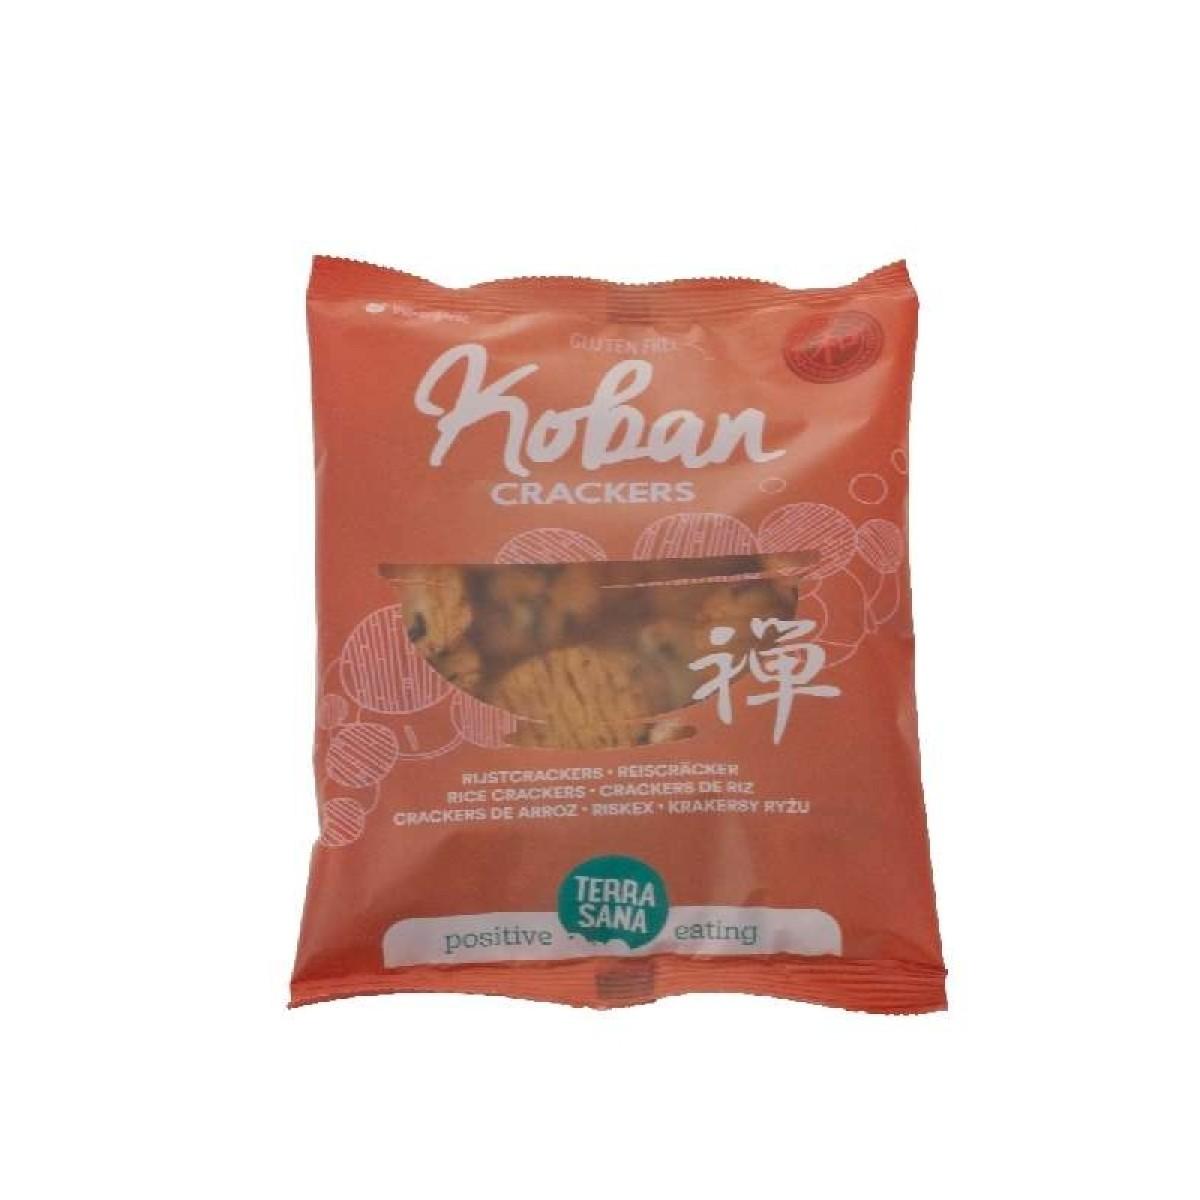 Koban Crackers